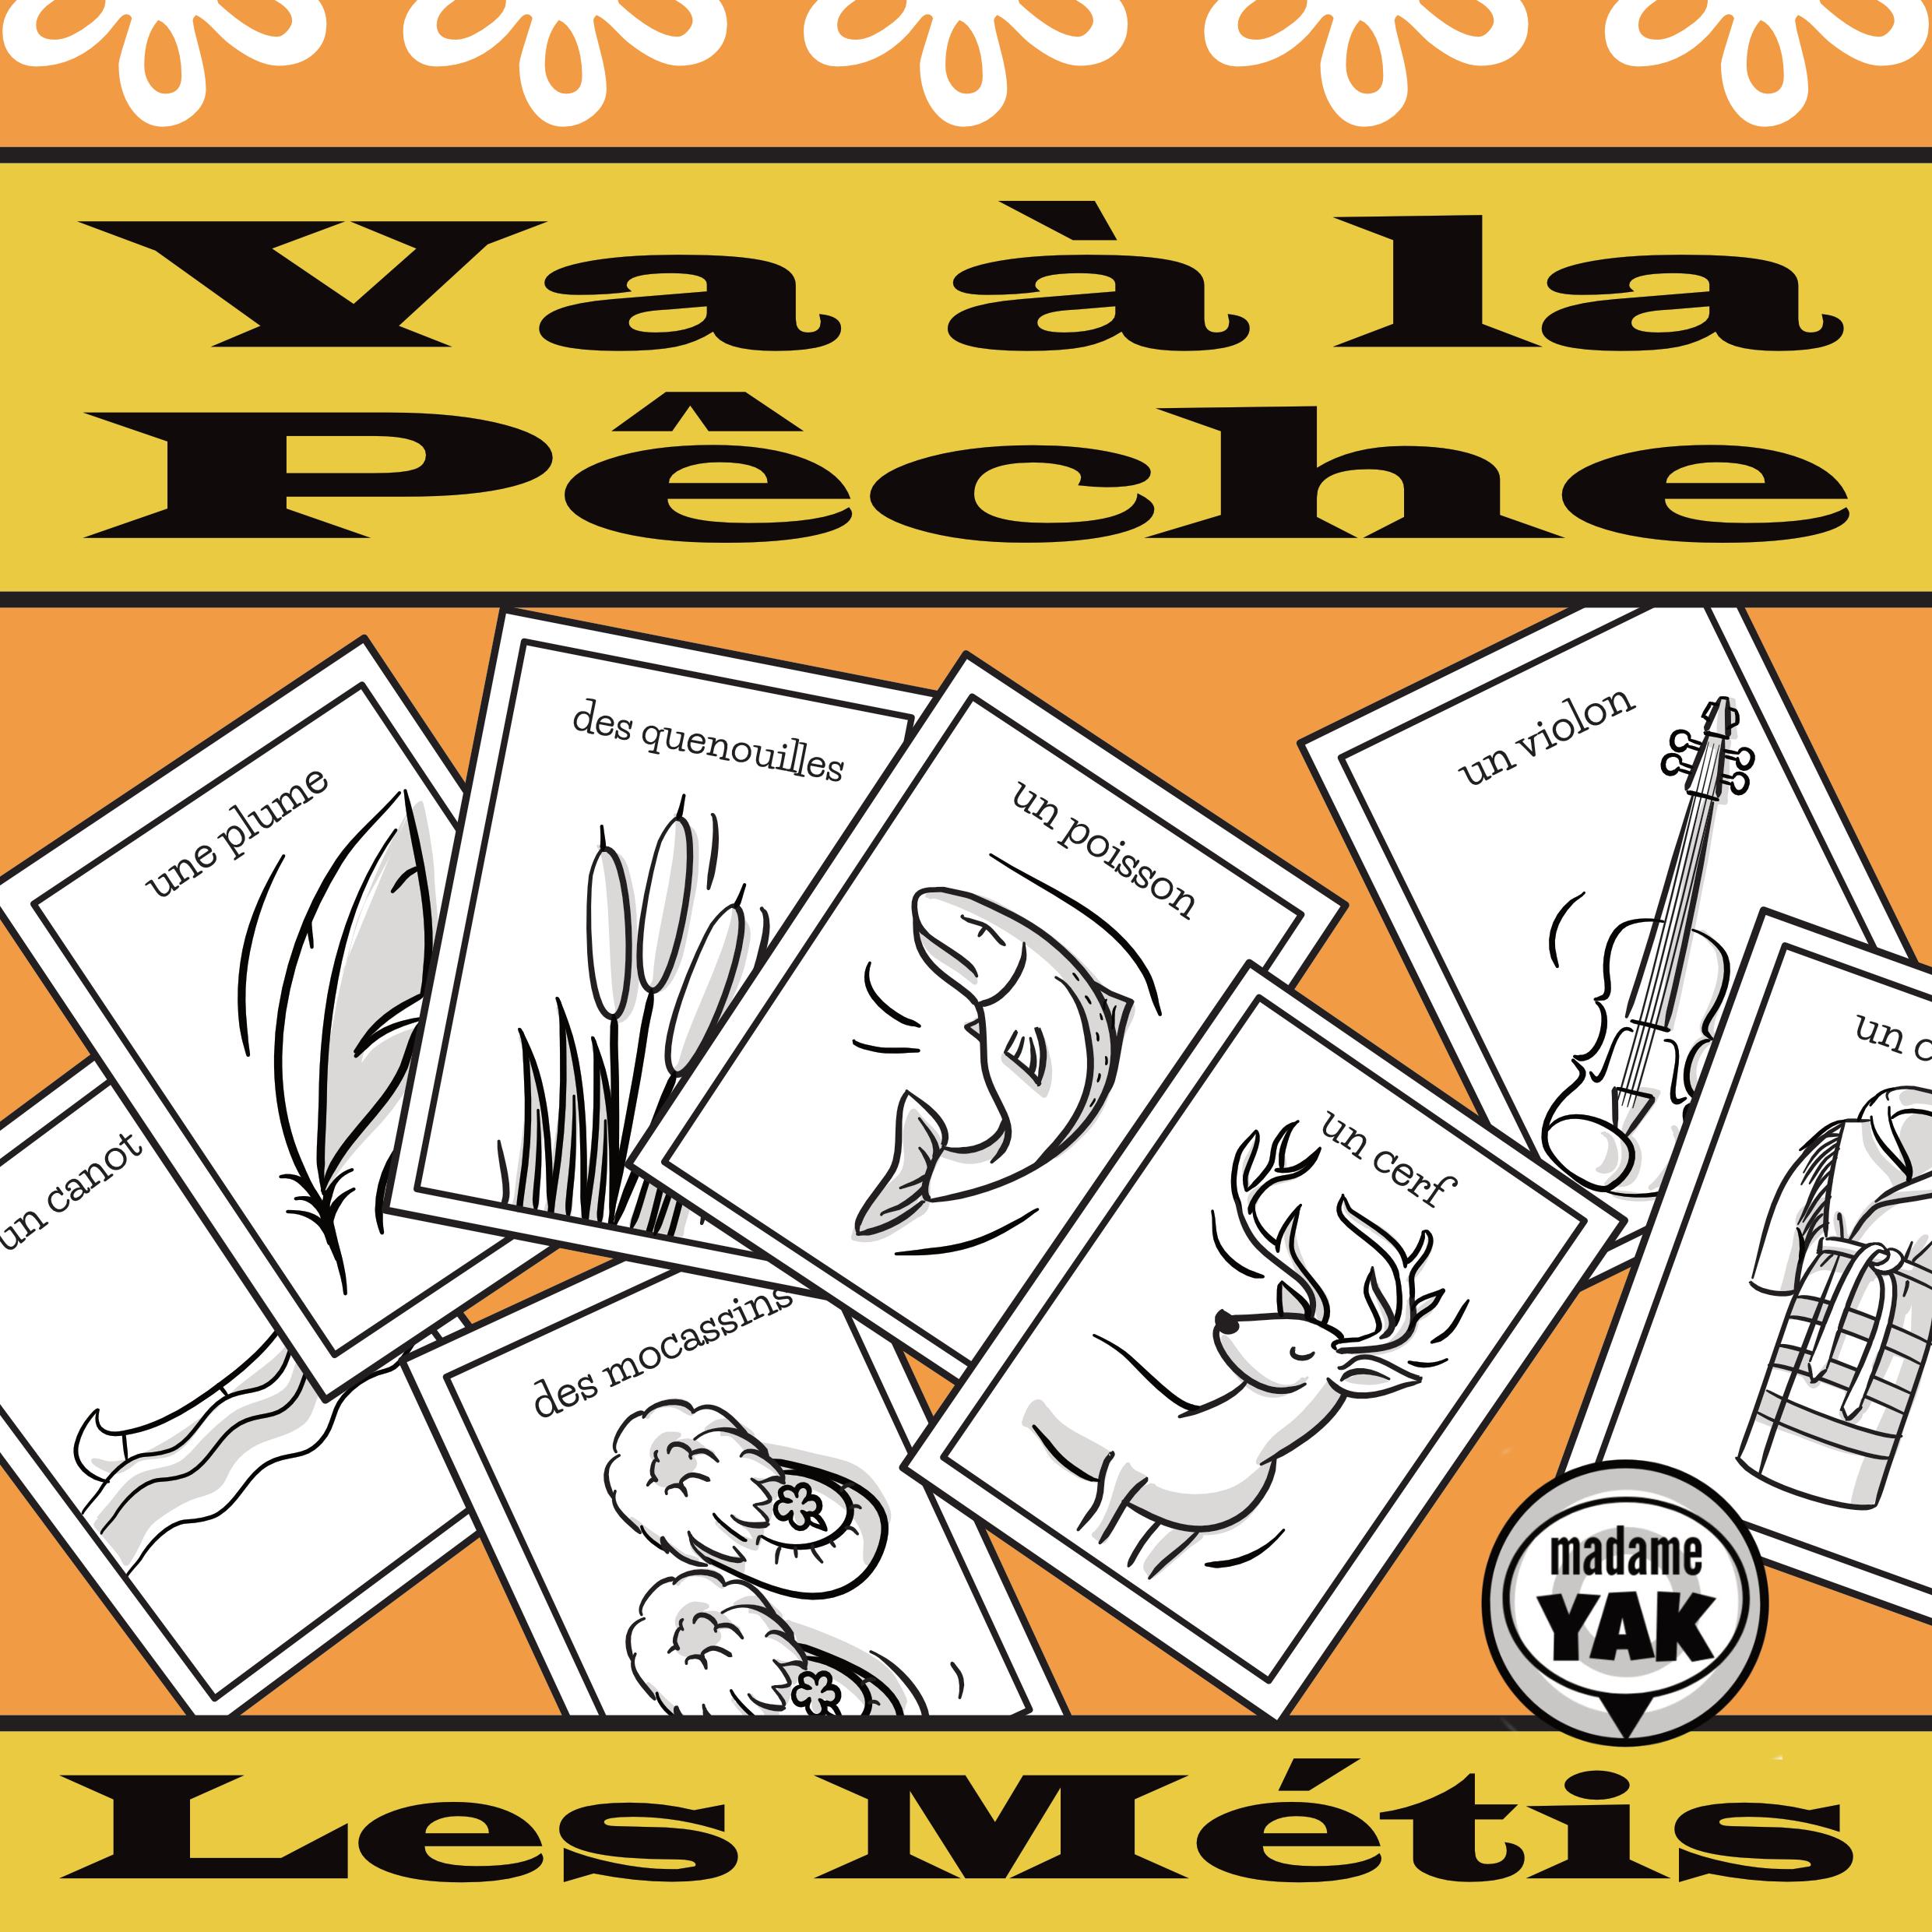 Le Vocabulaire Des Metis French Metis Vocabulary Games